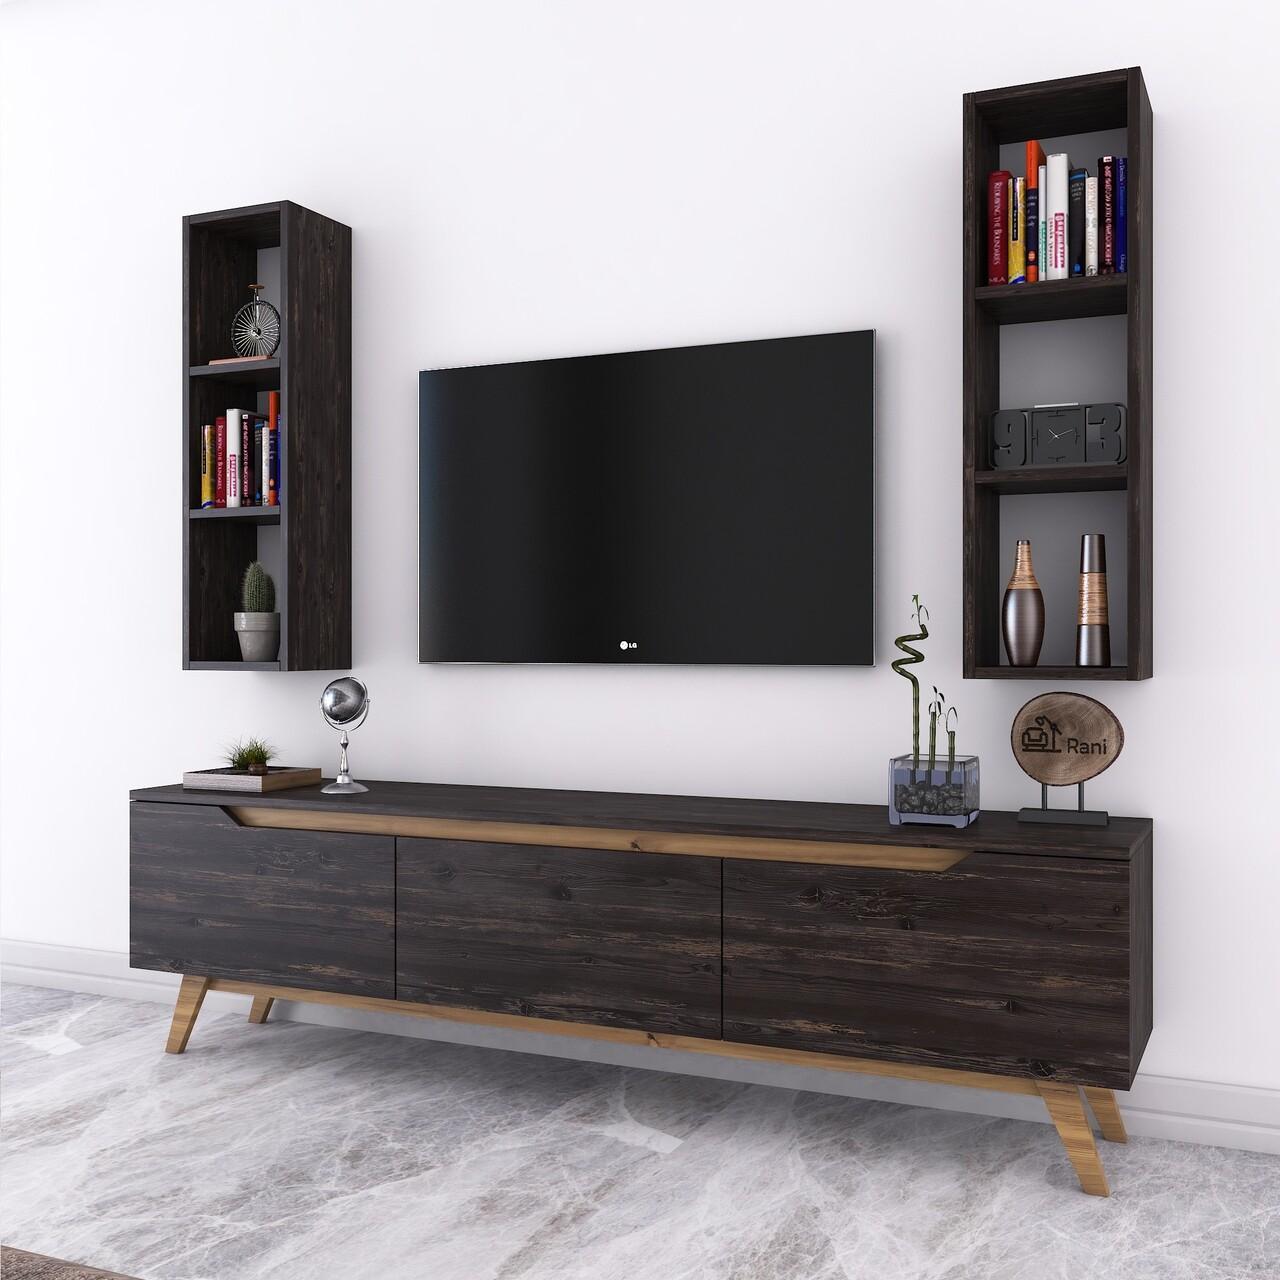 Comoda TV cu 2 rafturi de perete M6 - 1015, Wren, 180 x 35 x 48.6 cm/90 cm, black/walnut